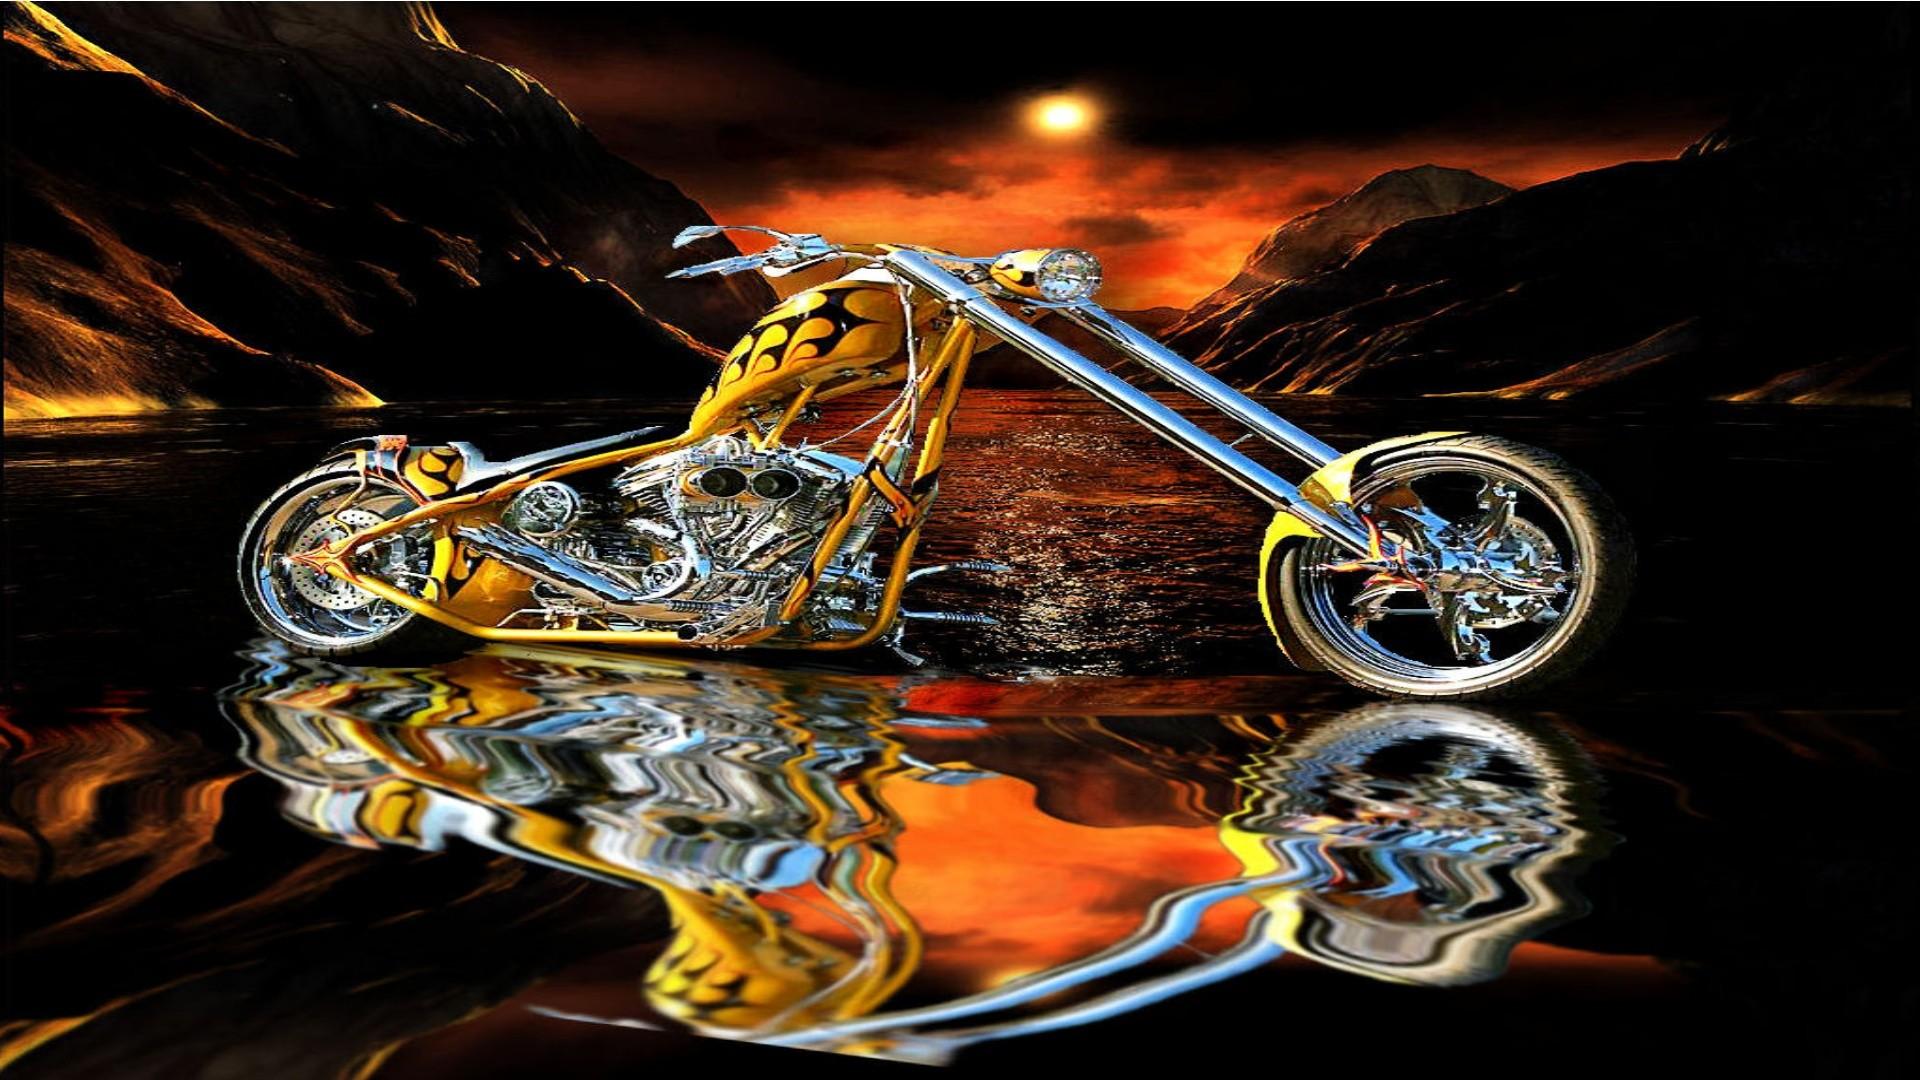 Razer Wallpaper HD Resolution Download #vphq » VaLvewz.com